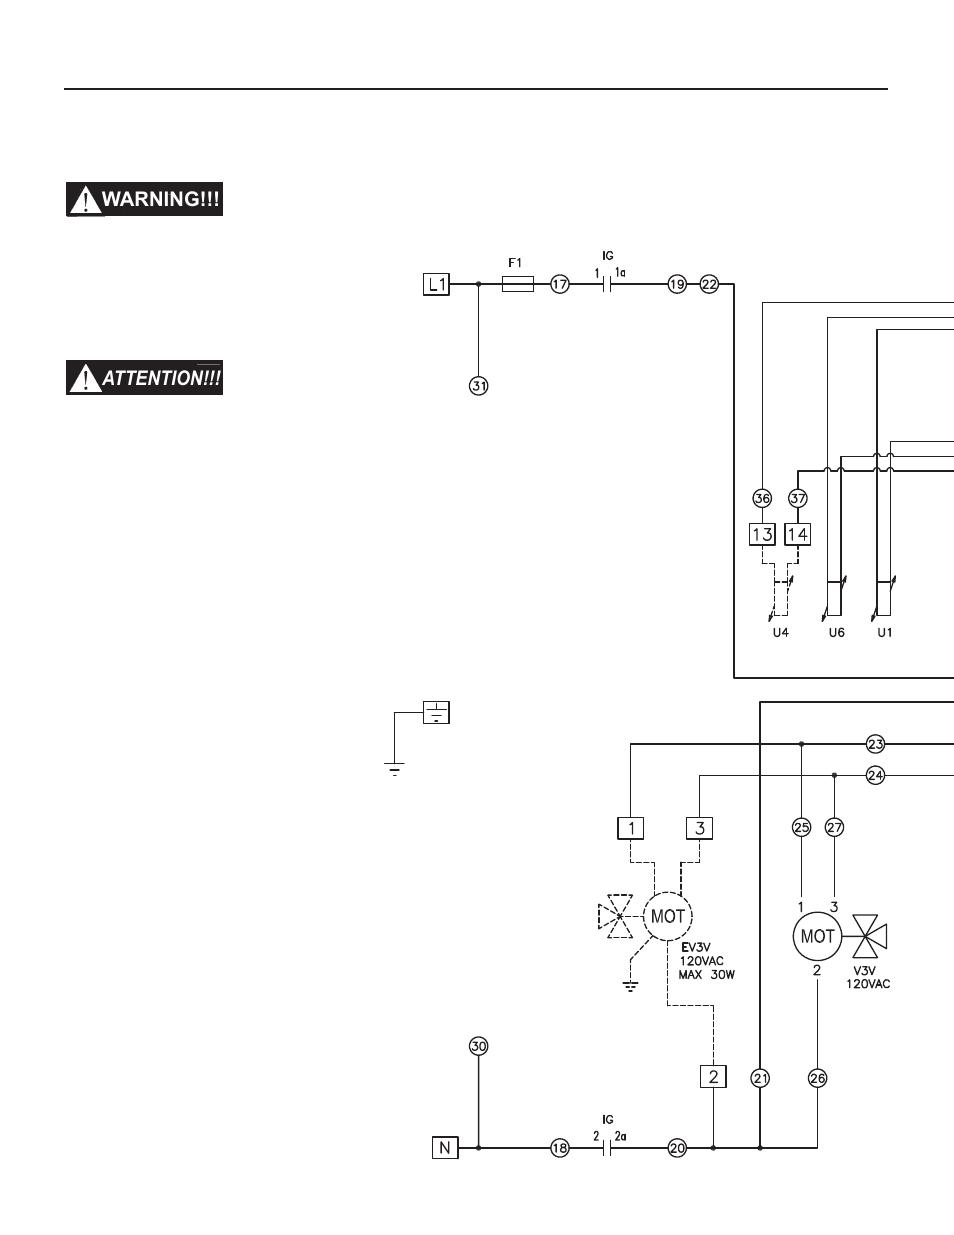 15 - functional wiring diagram, 14 - maintenance | Slant/Fin VSL-160C